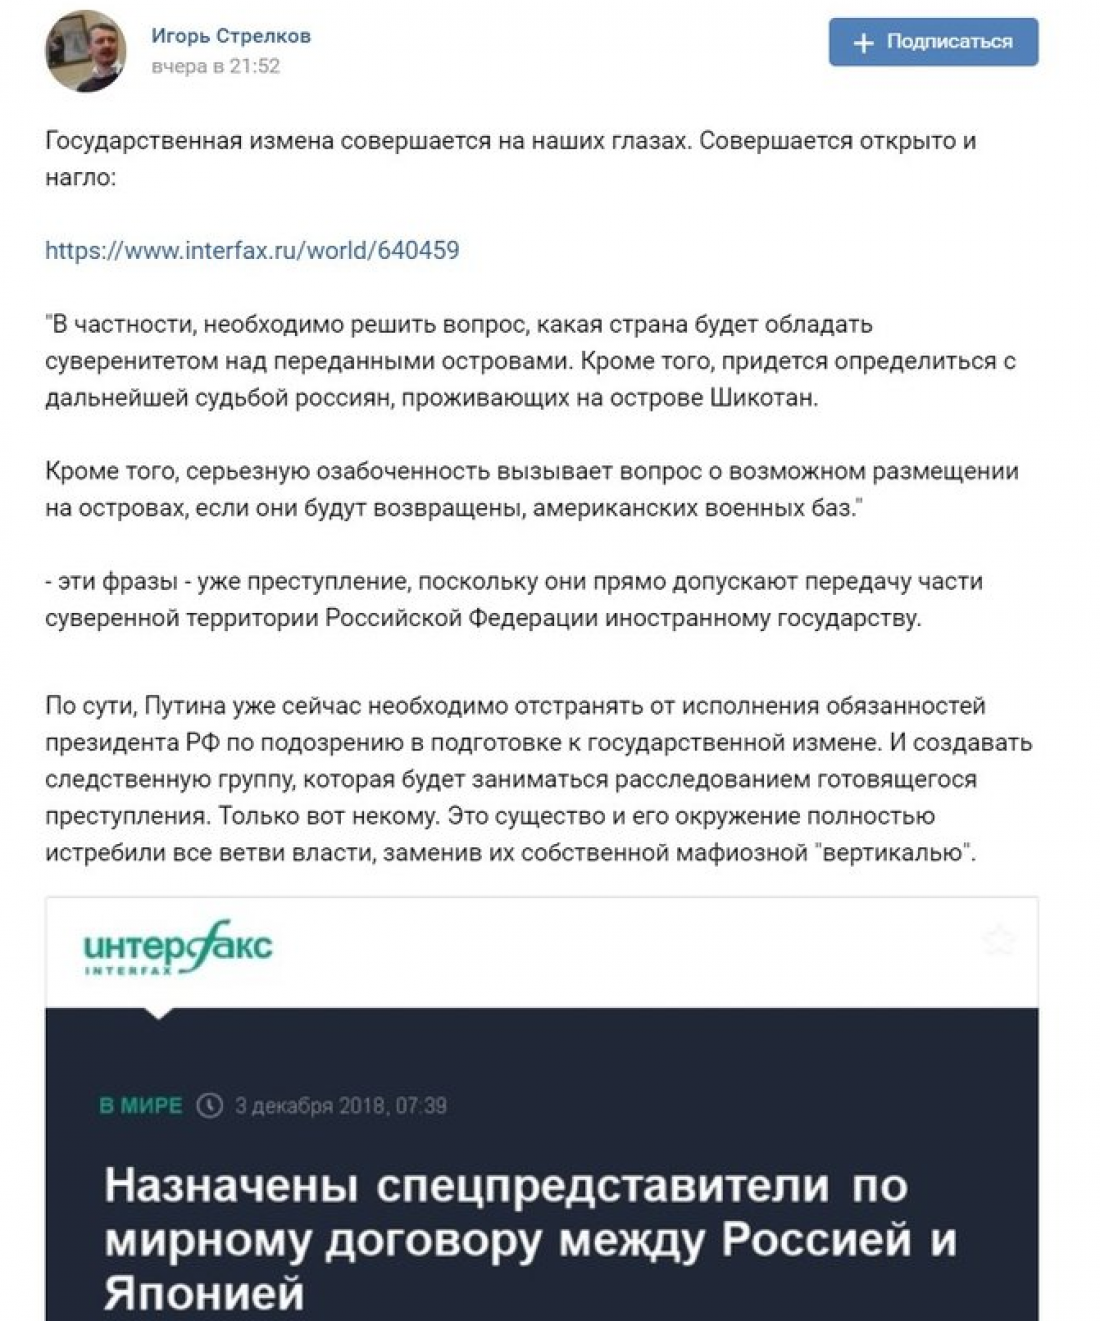 Бывший сотрудник ФСБ заговорил об отстранении Путина от исполнения обязанностей президента РФ